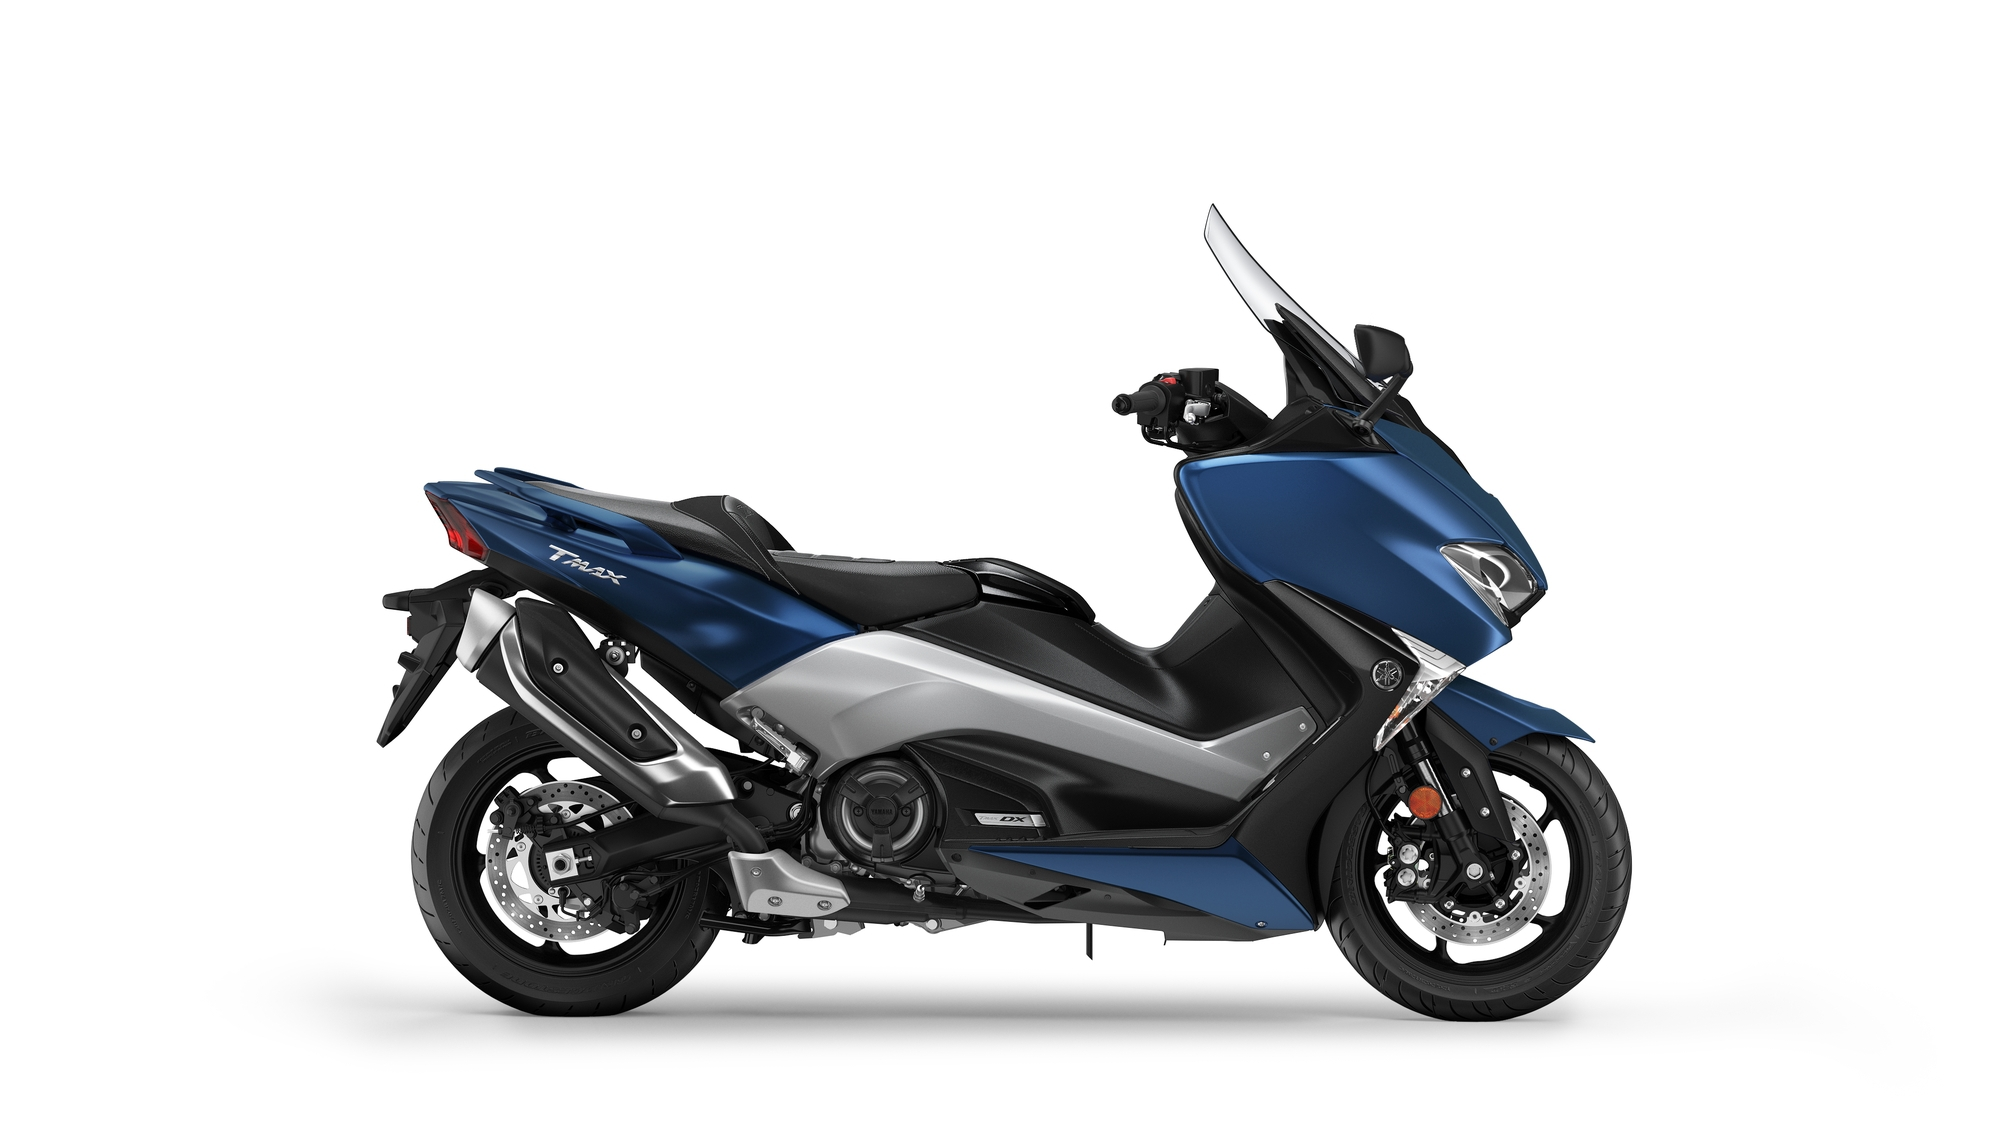 2017-Yamaha-TMAX-DX-EU-Phantom-Blue-Studio-002 (1)